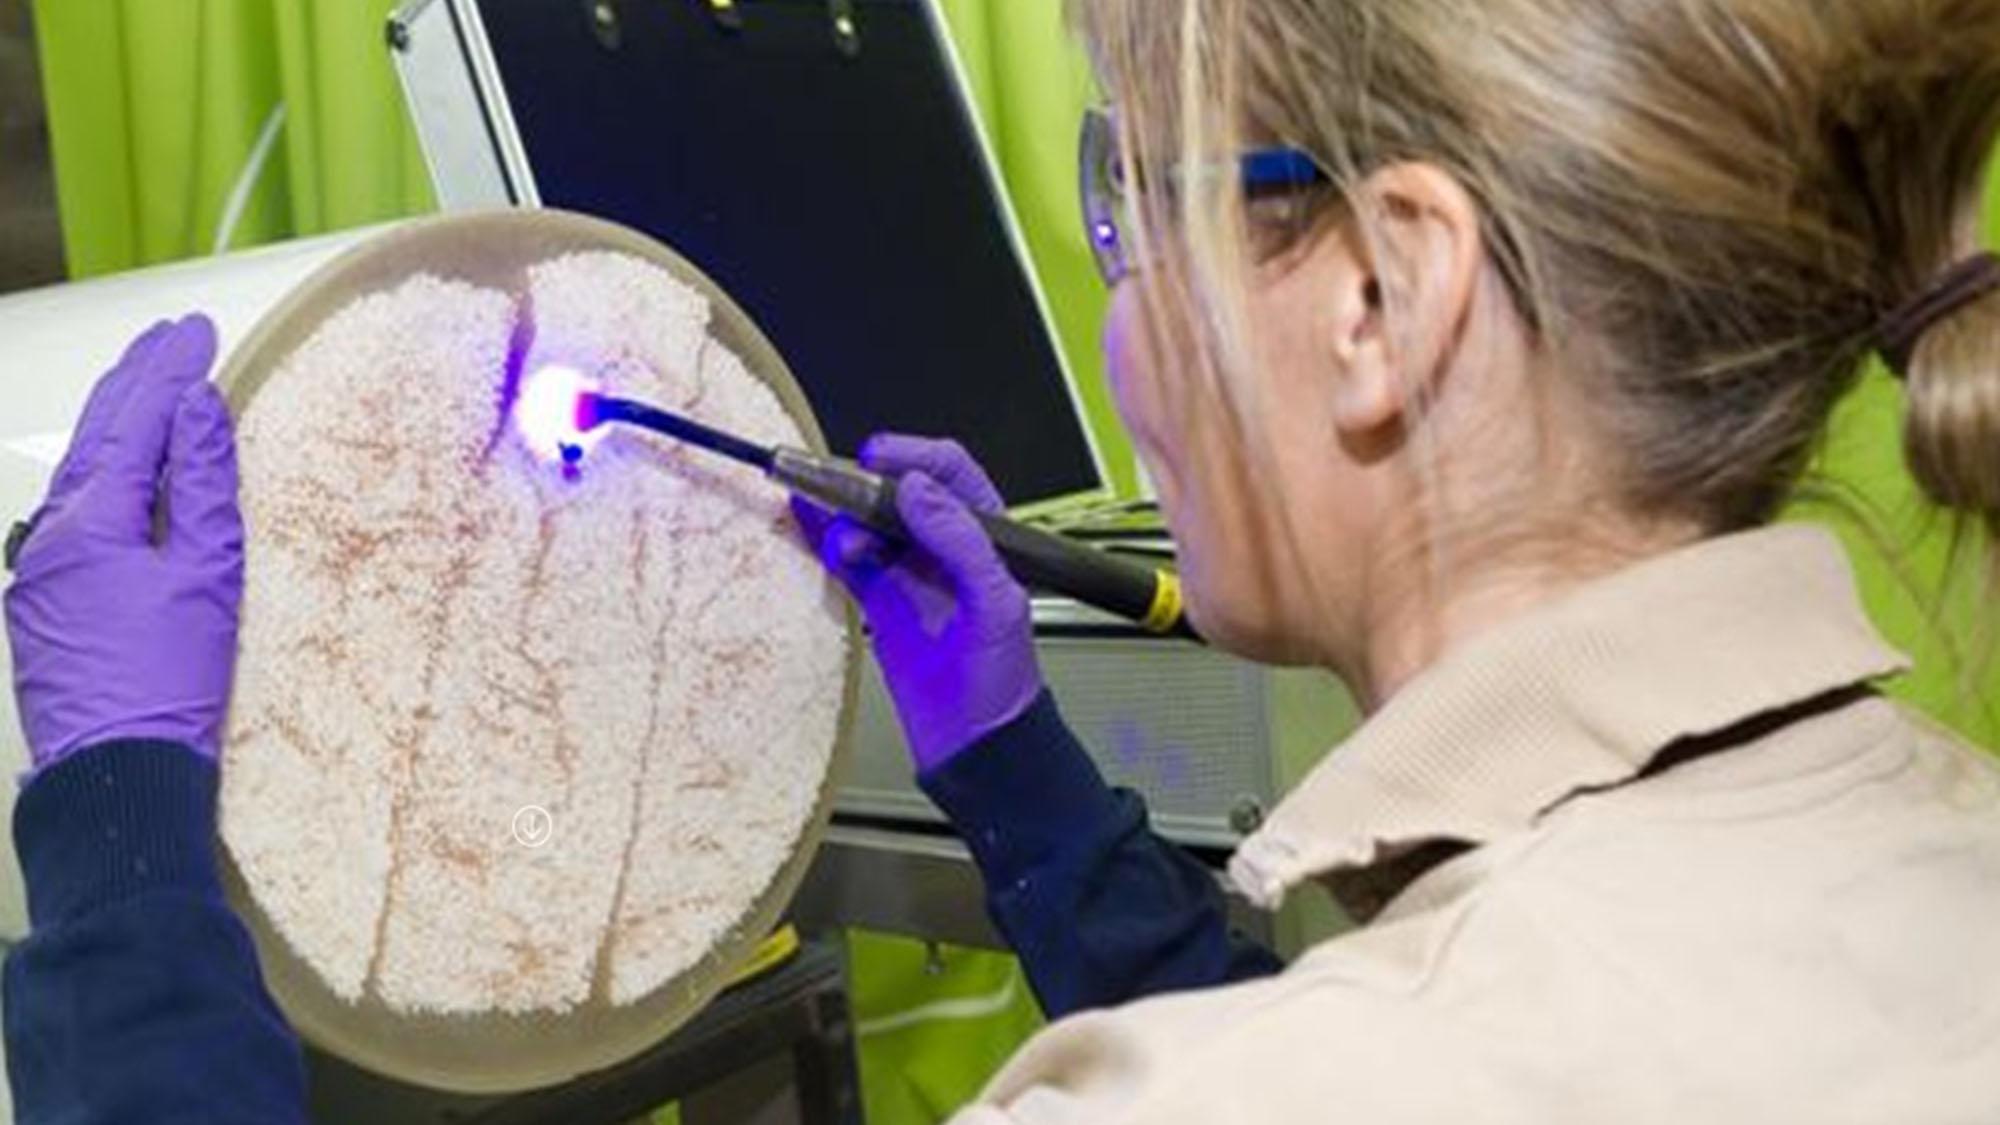 Laboratory tech